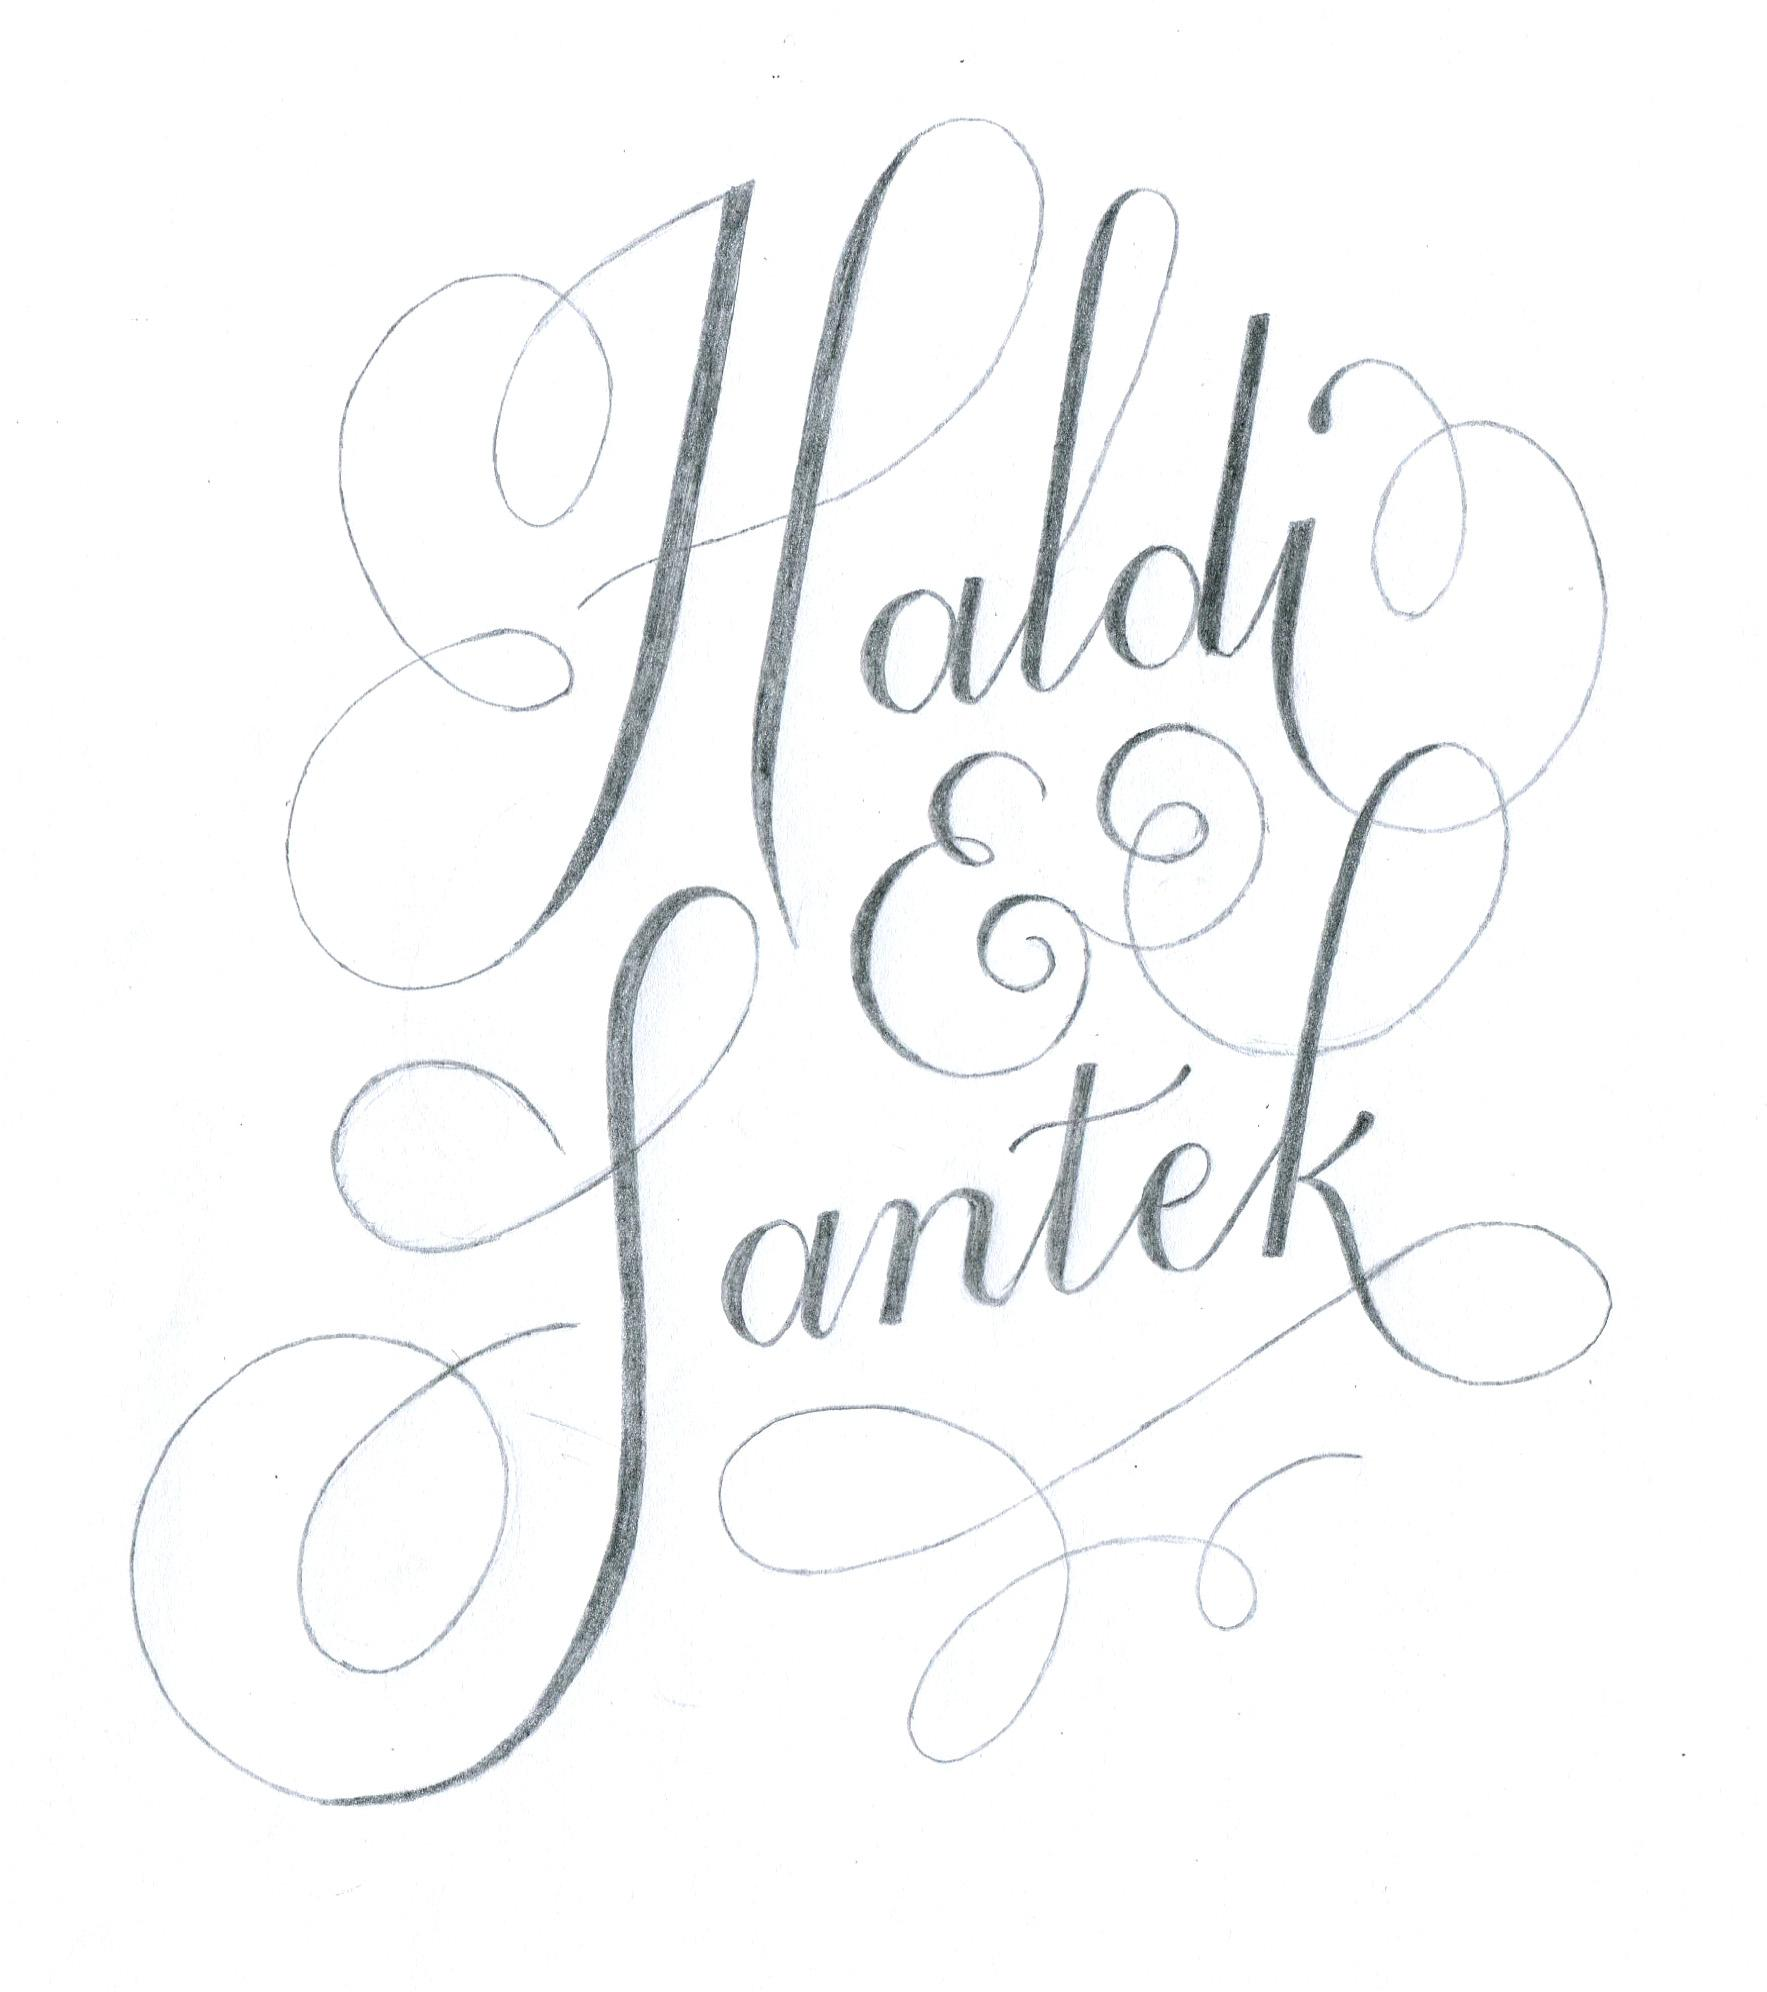 Haldi & Santek - image 8 - student project